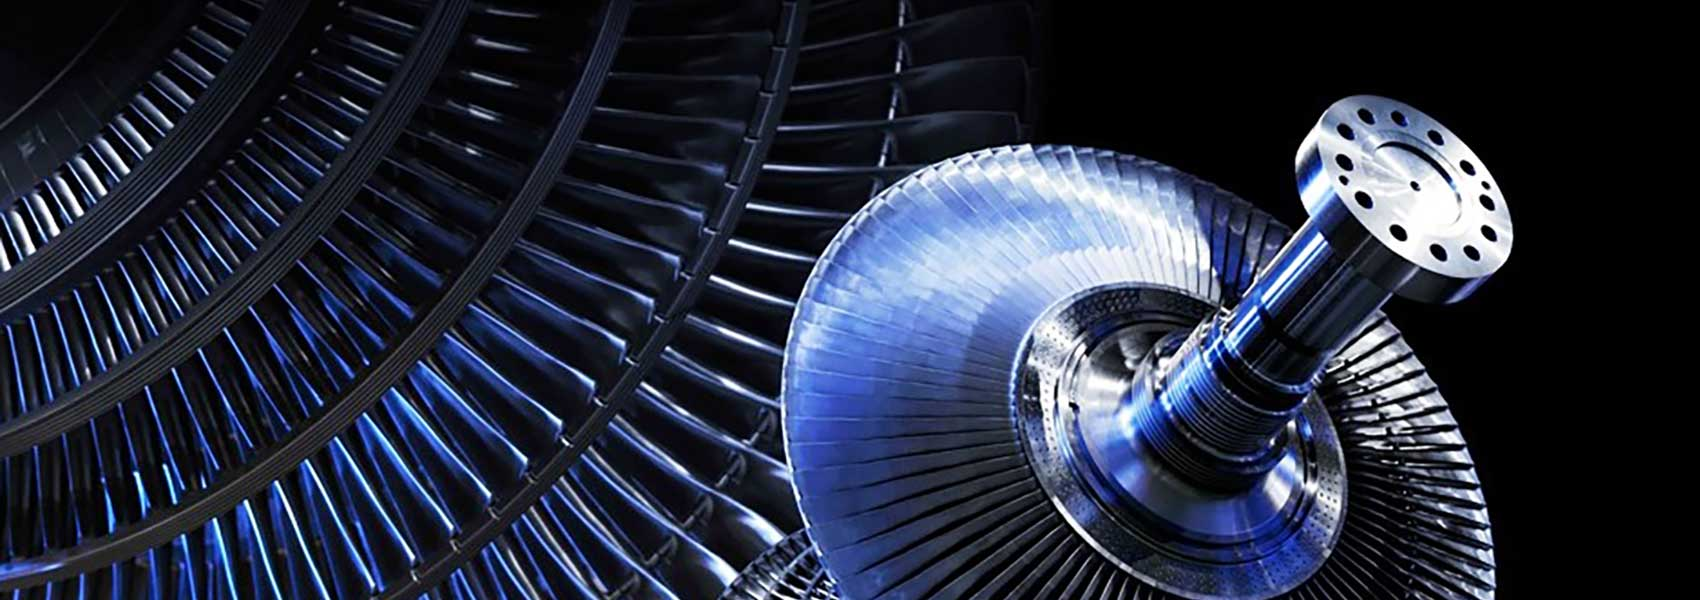 Power Generation Inside Taes Toshiba America Energy